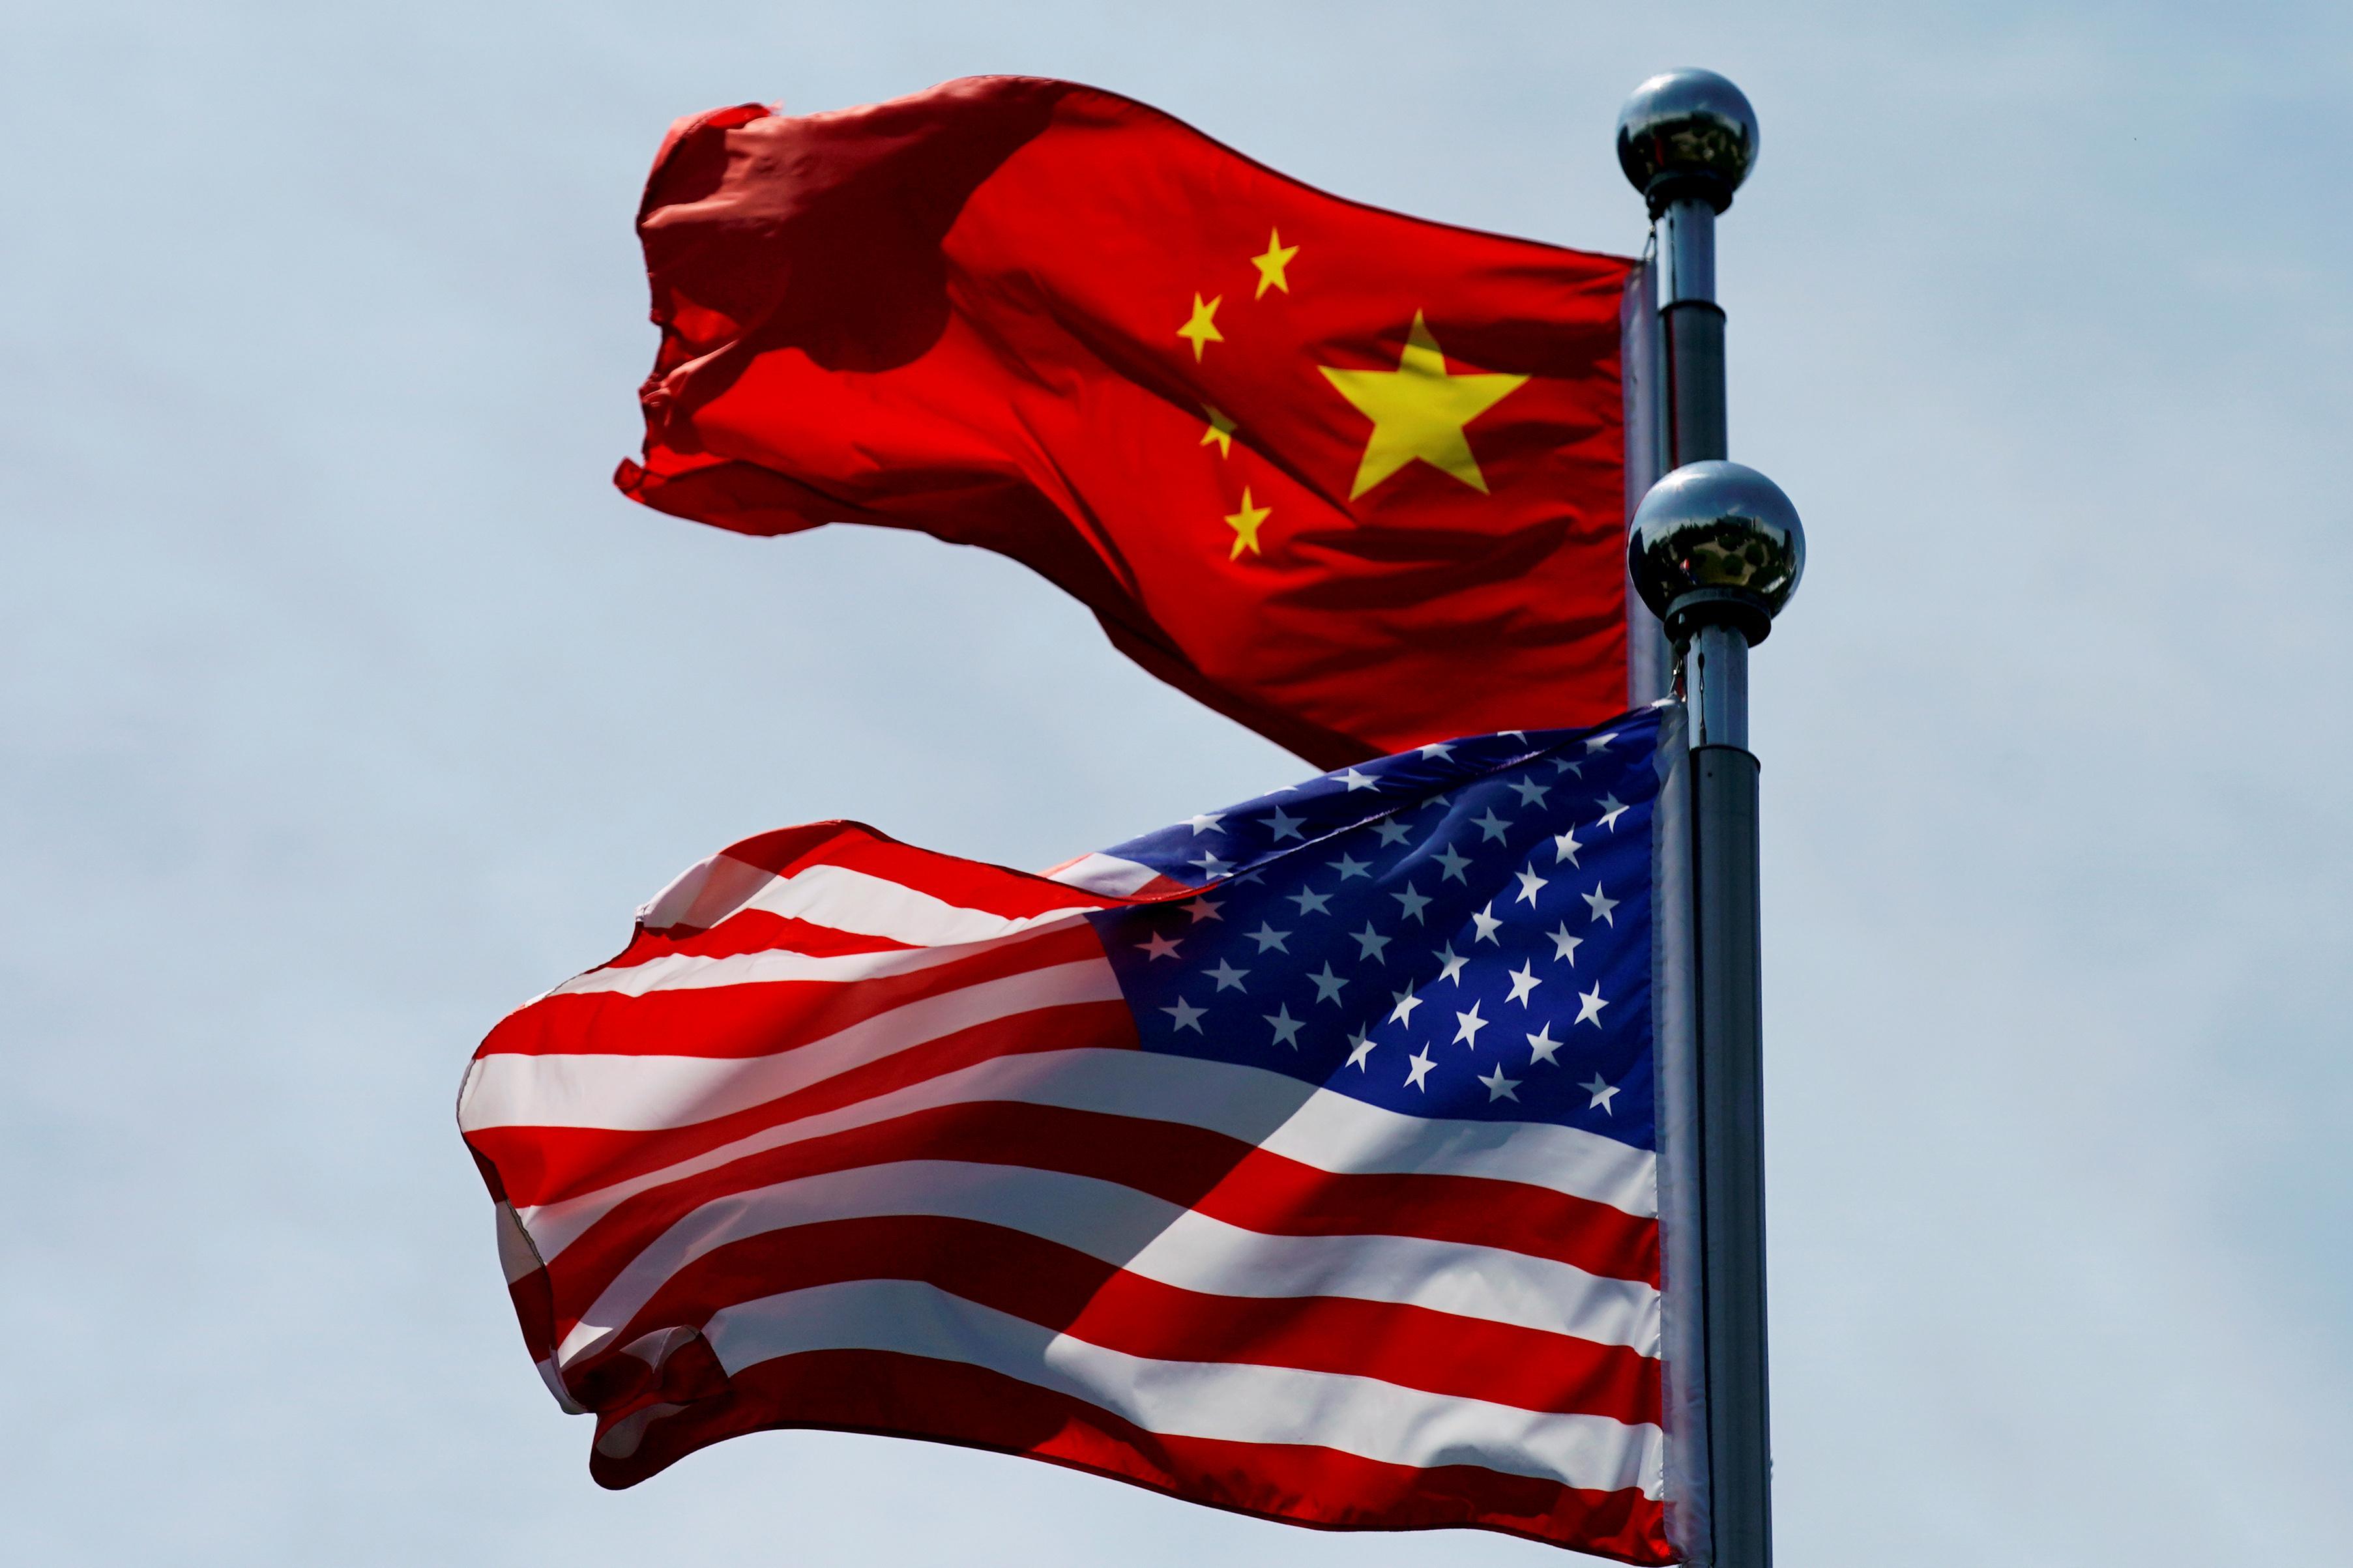 U.S., China agree to resume trade talks, markets jump